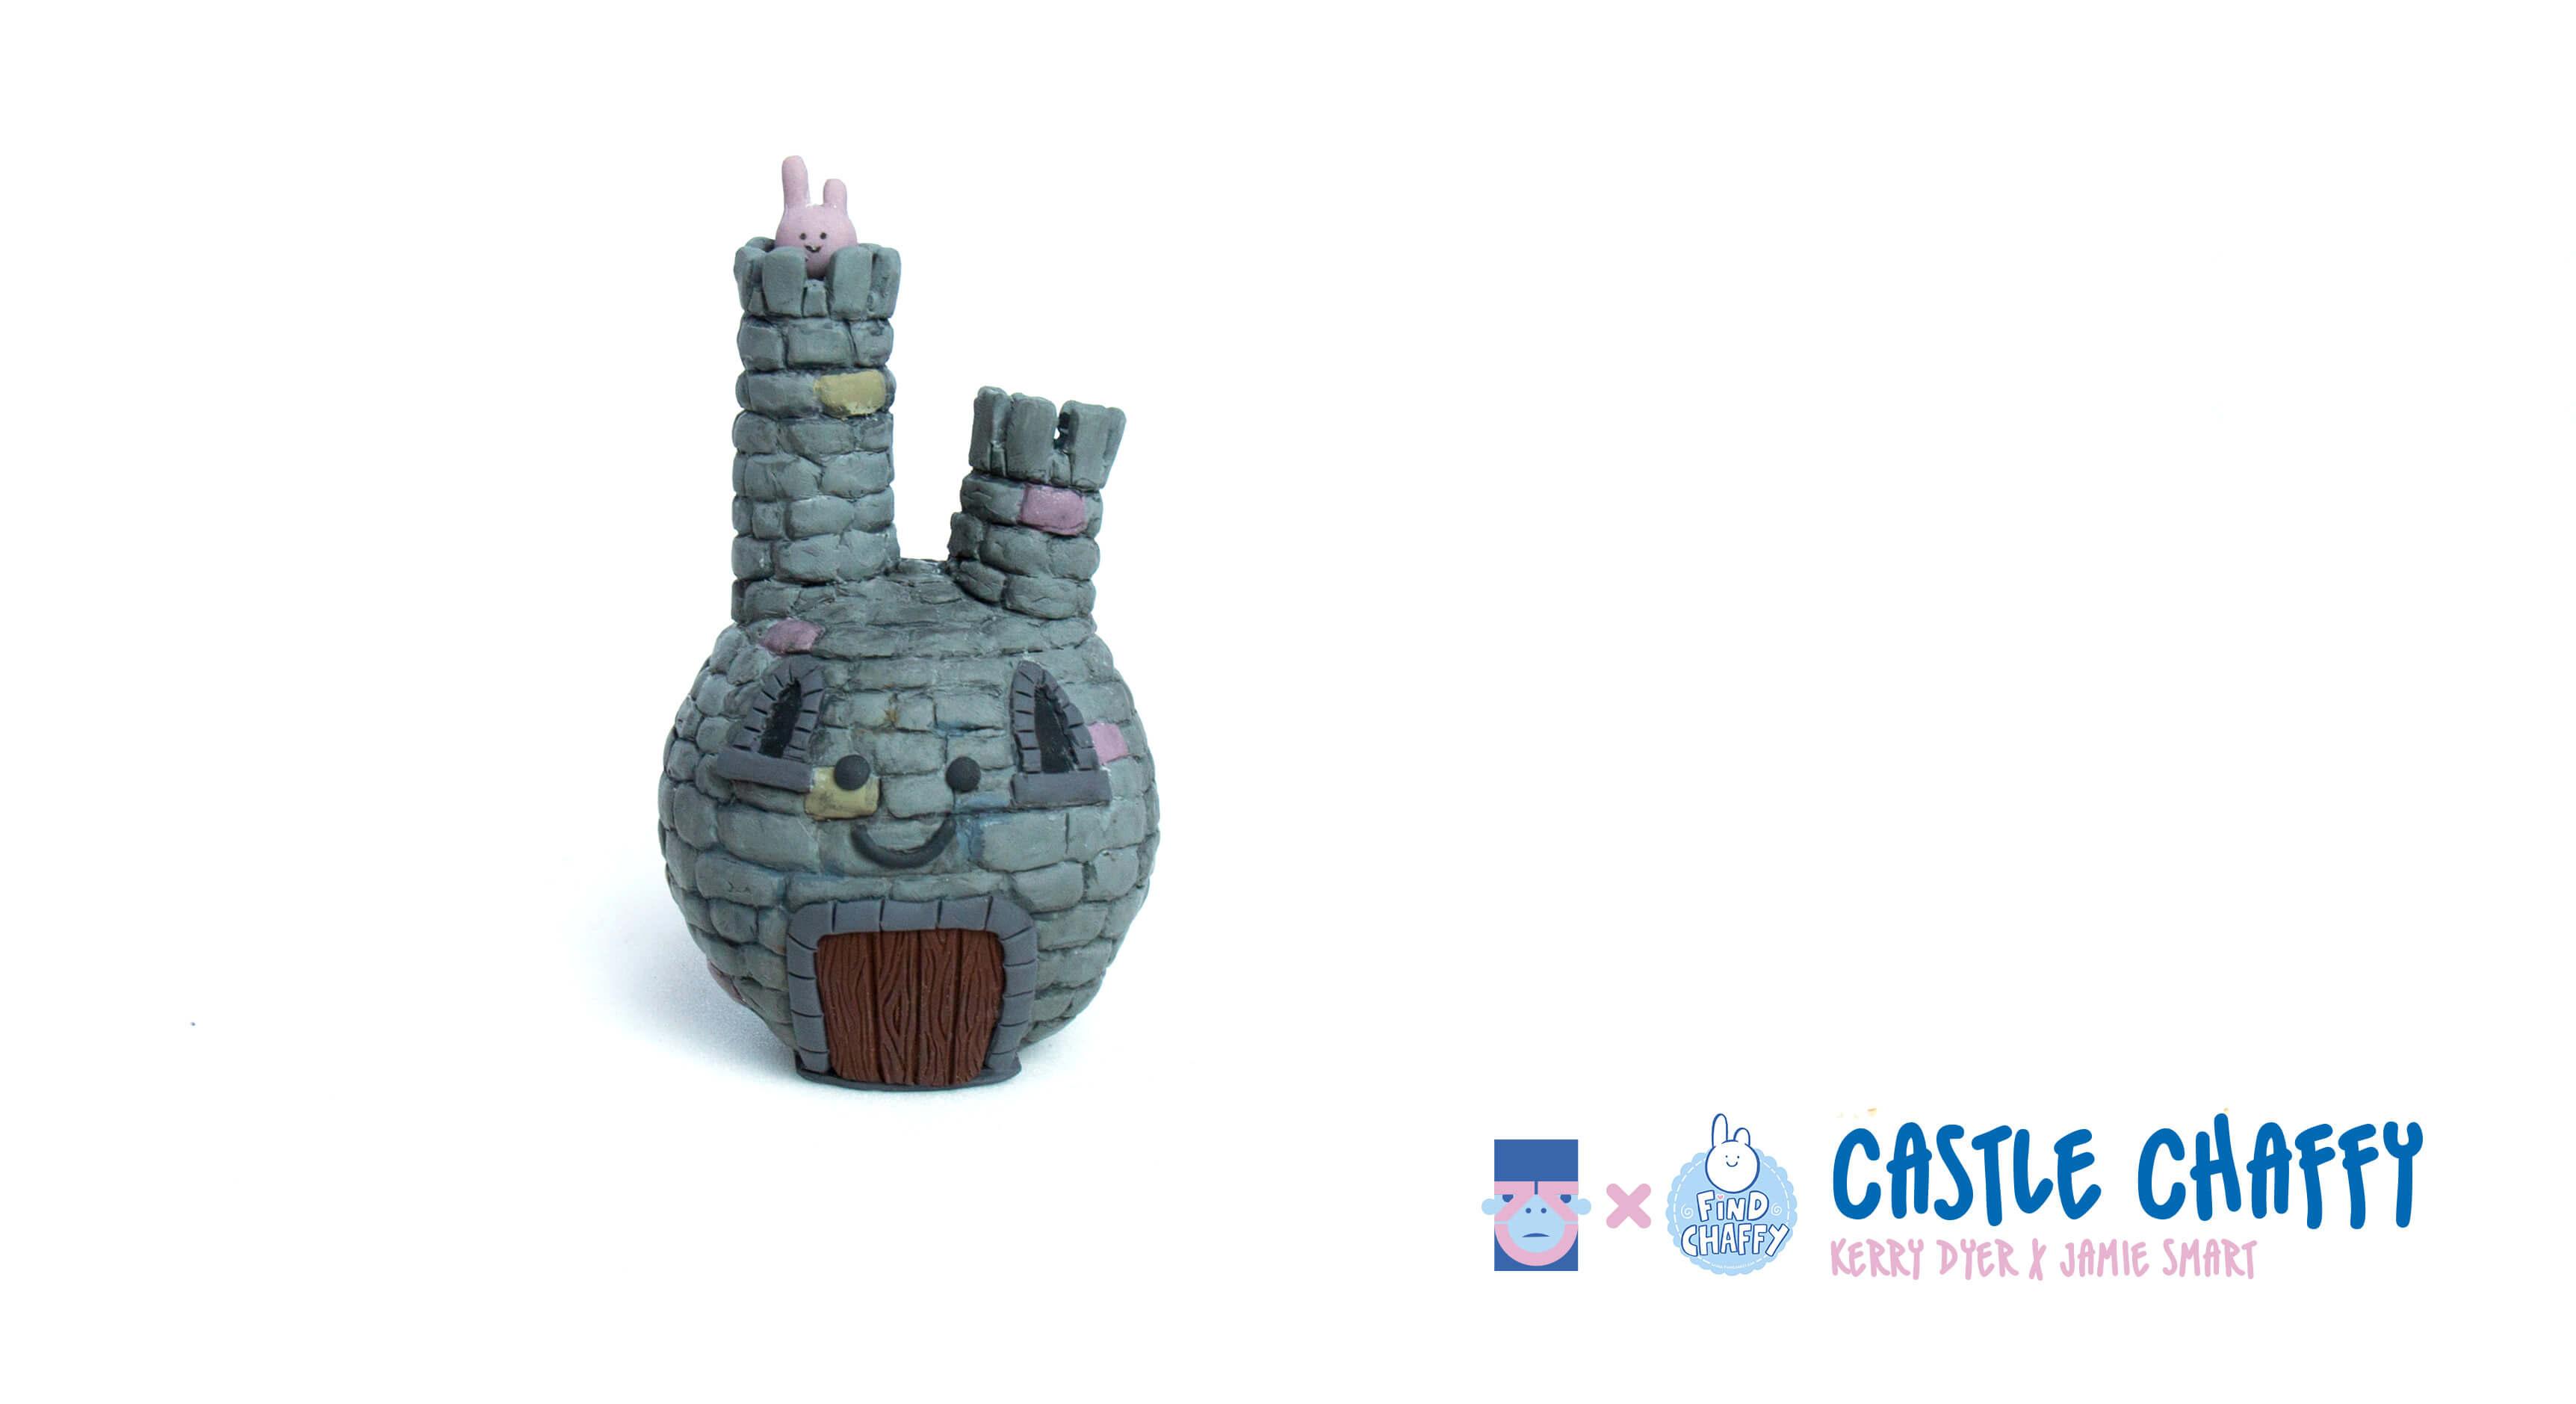 Castle-Chaffy4.2